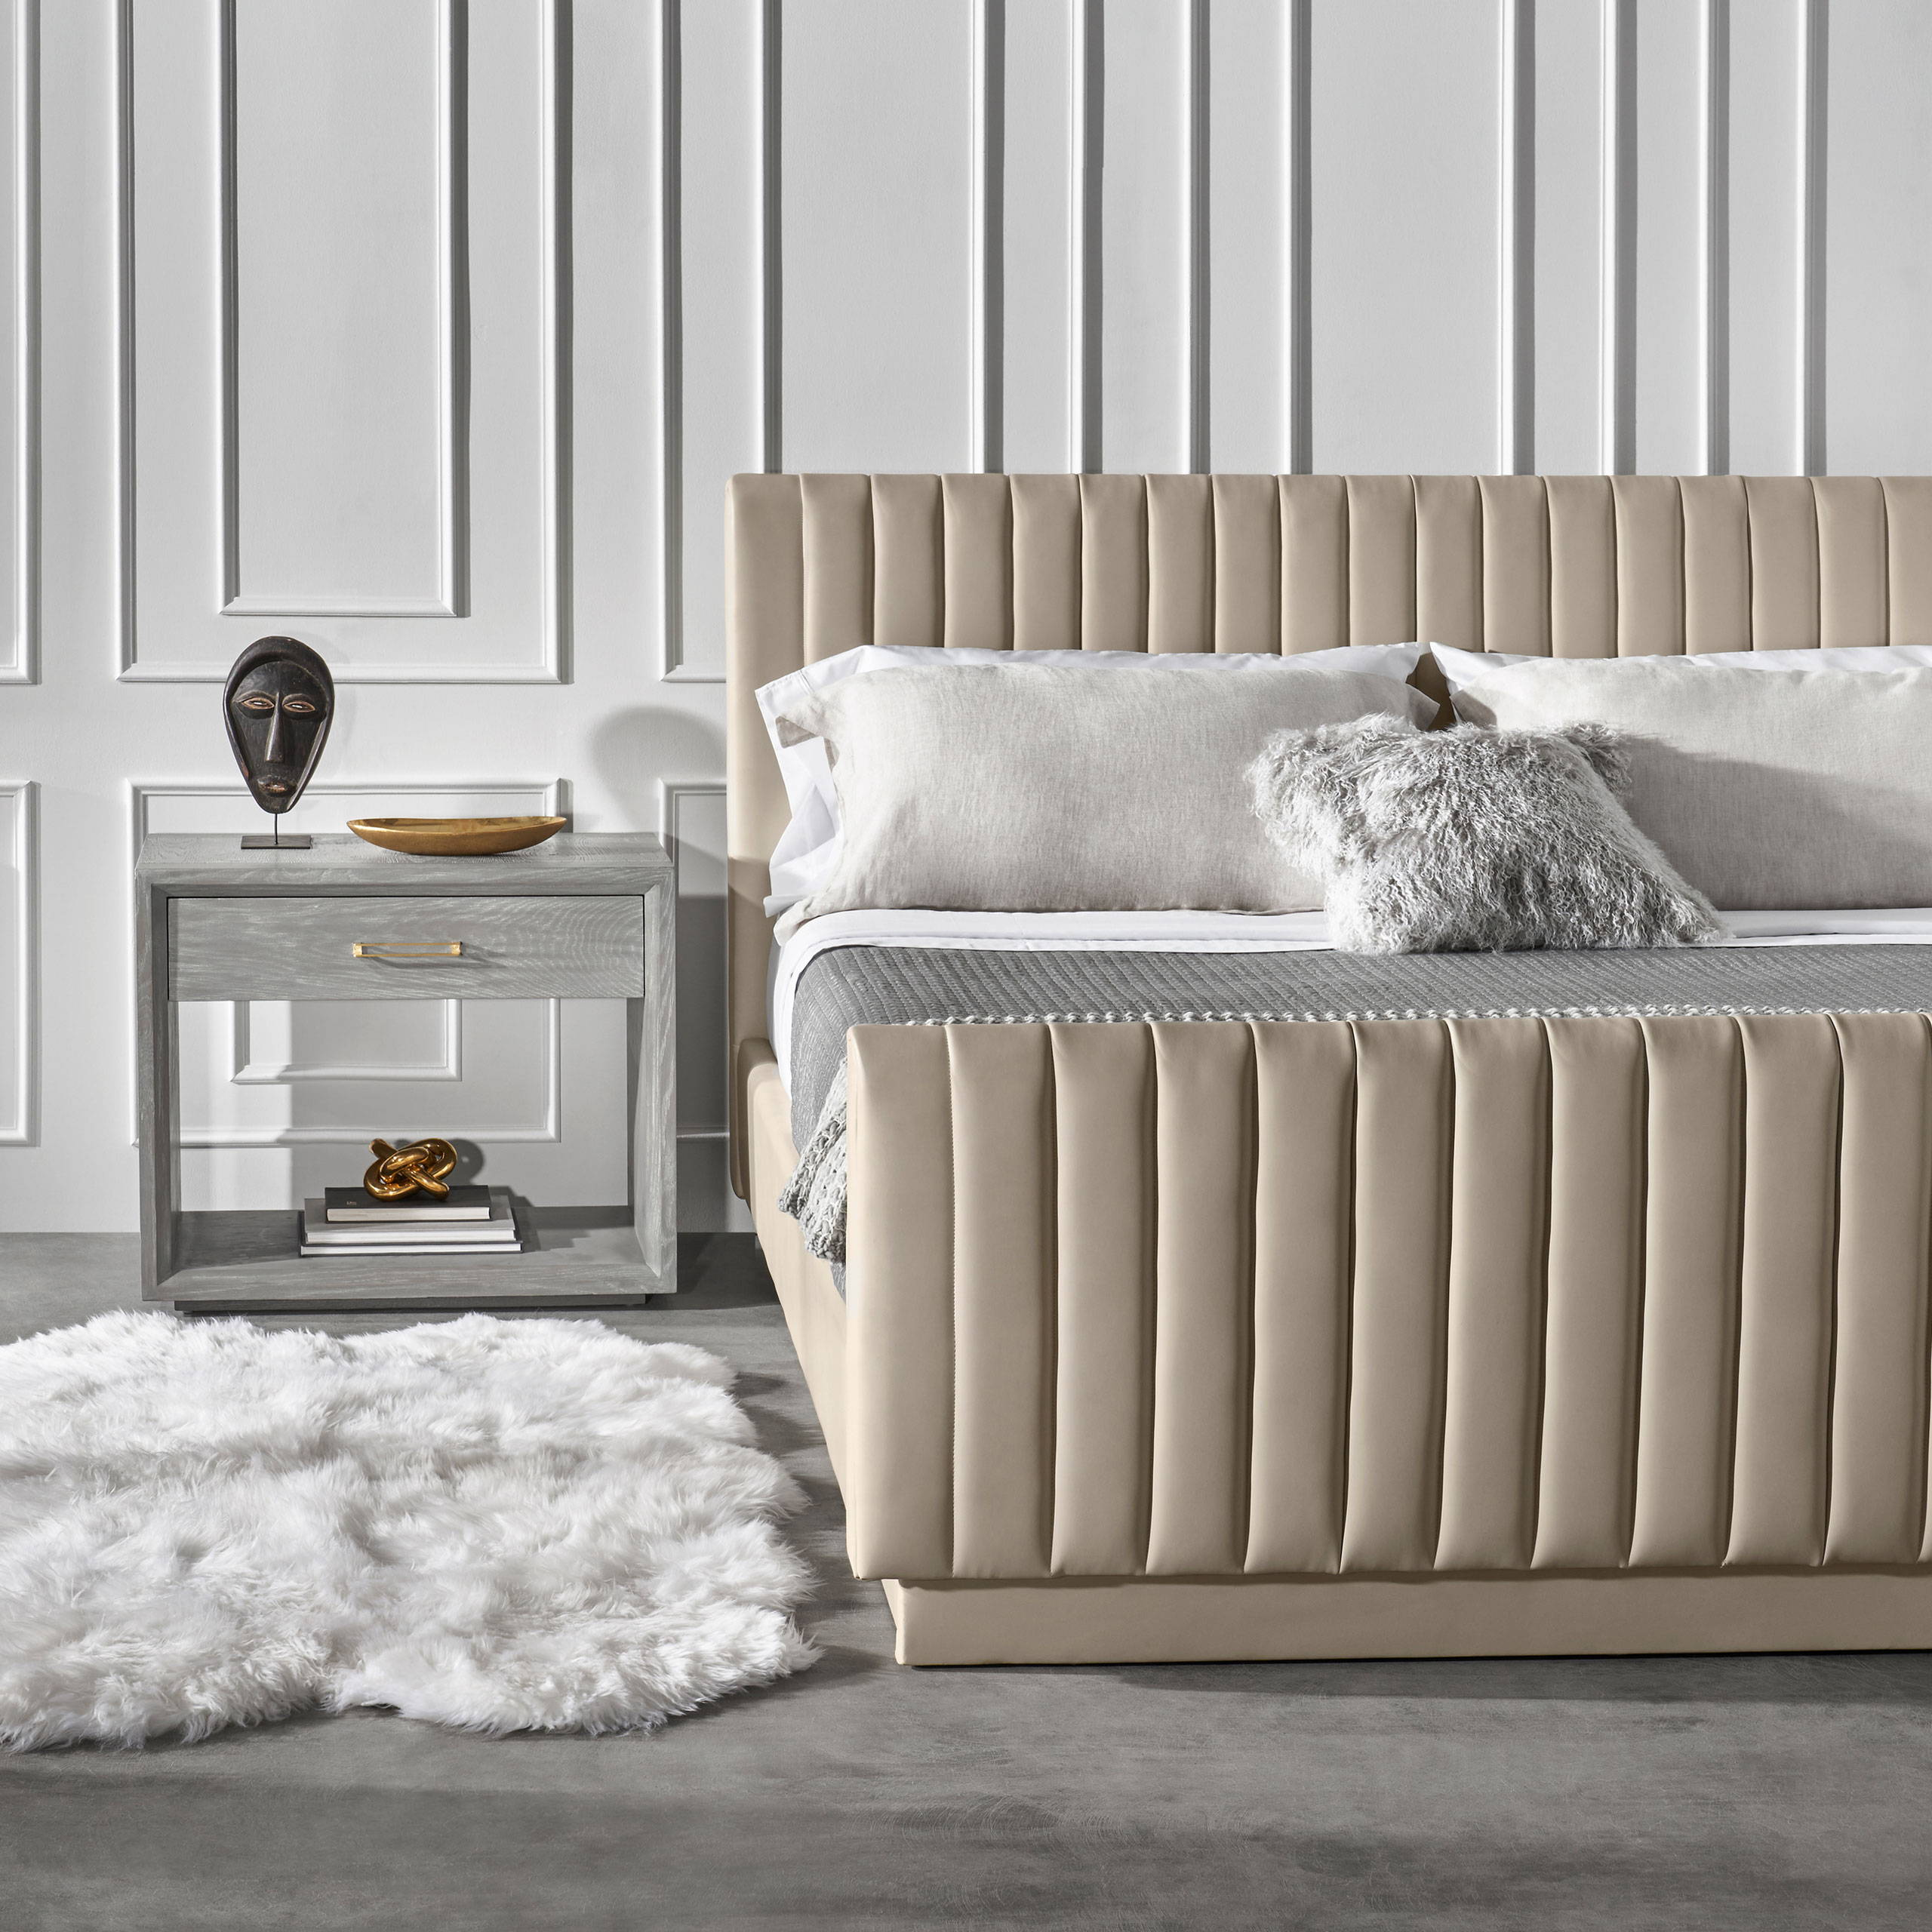 Shop Interlude Home Furniture